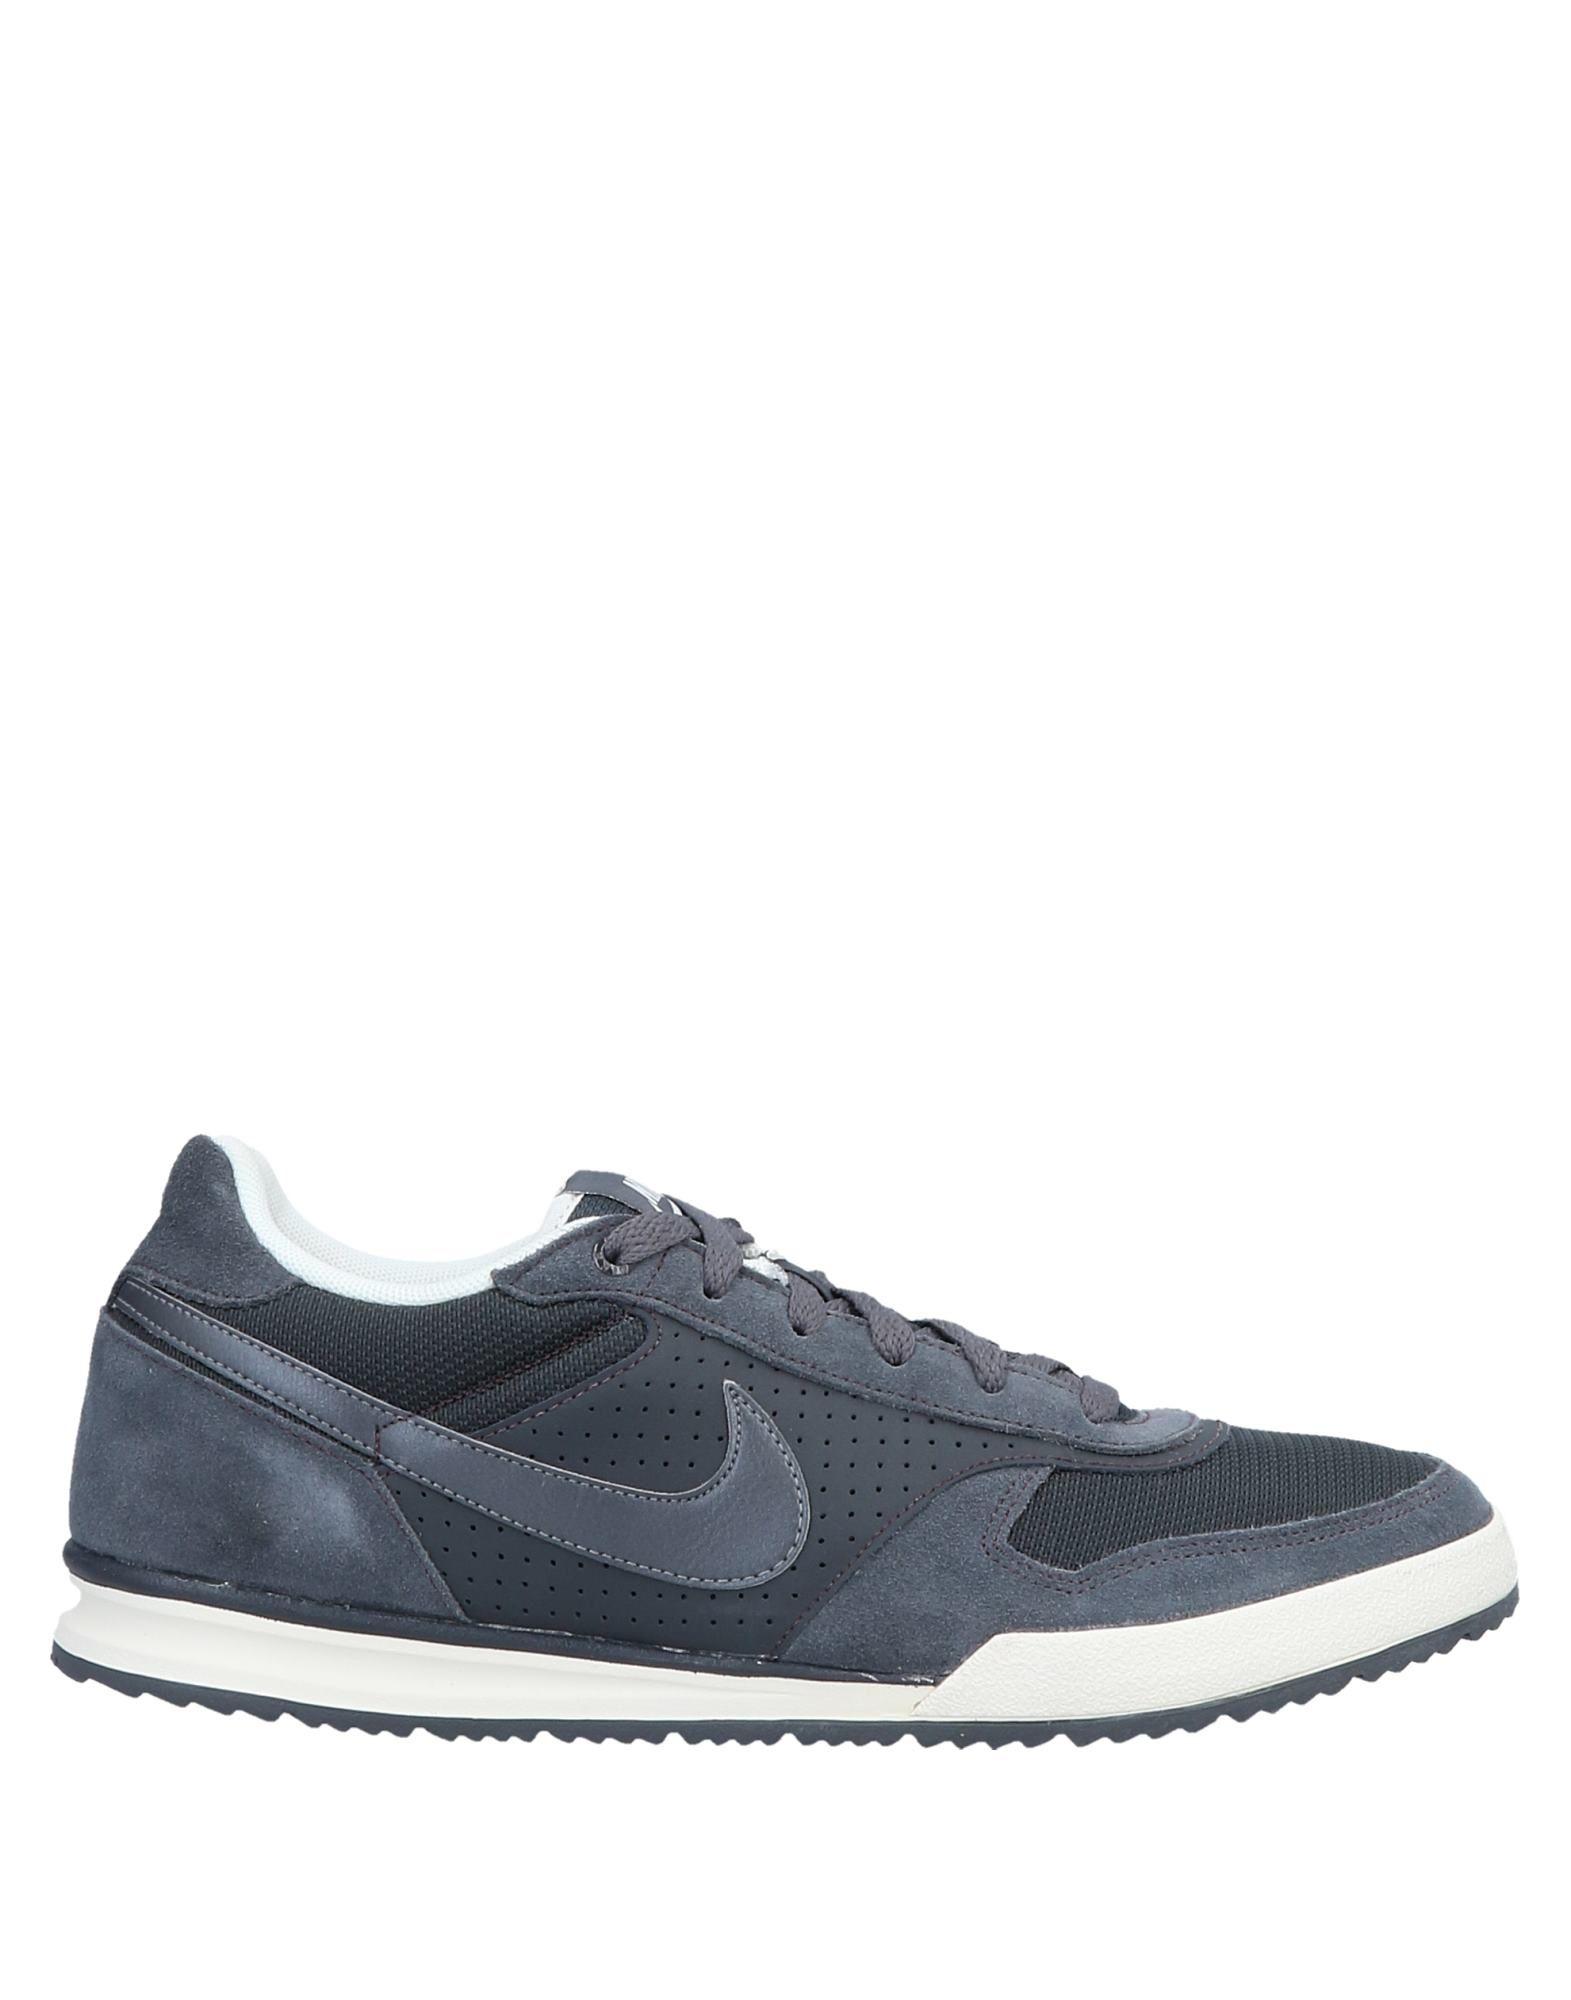 Rabatt echte Schuhe Nike Sneakers Herren  11571465BK